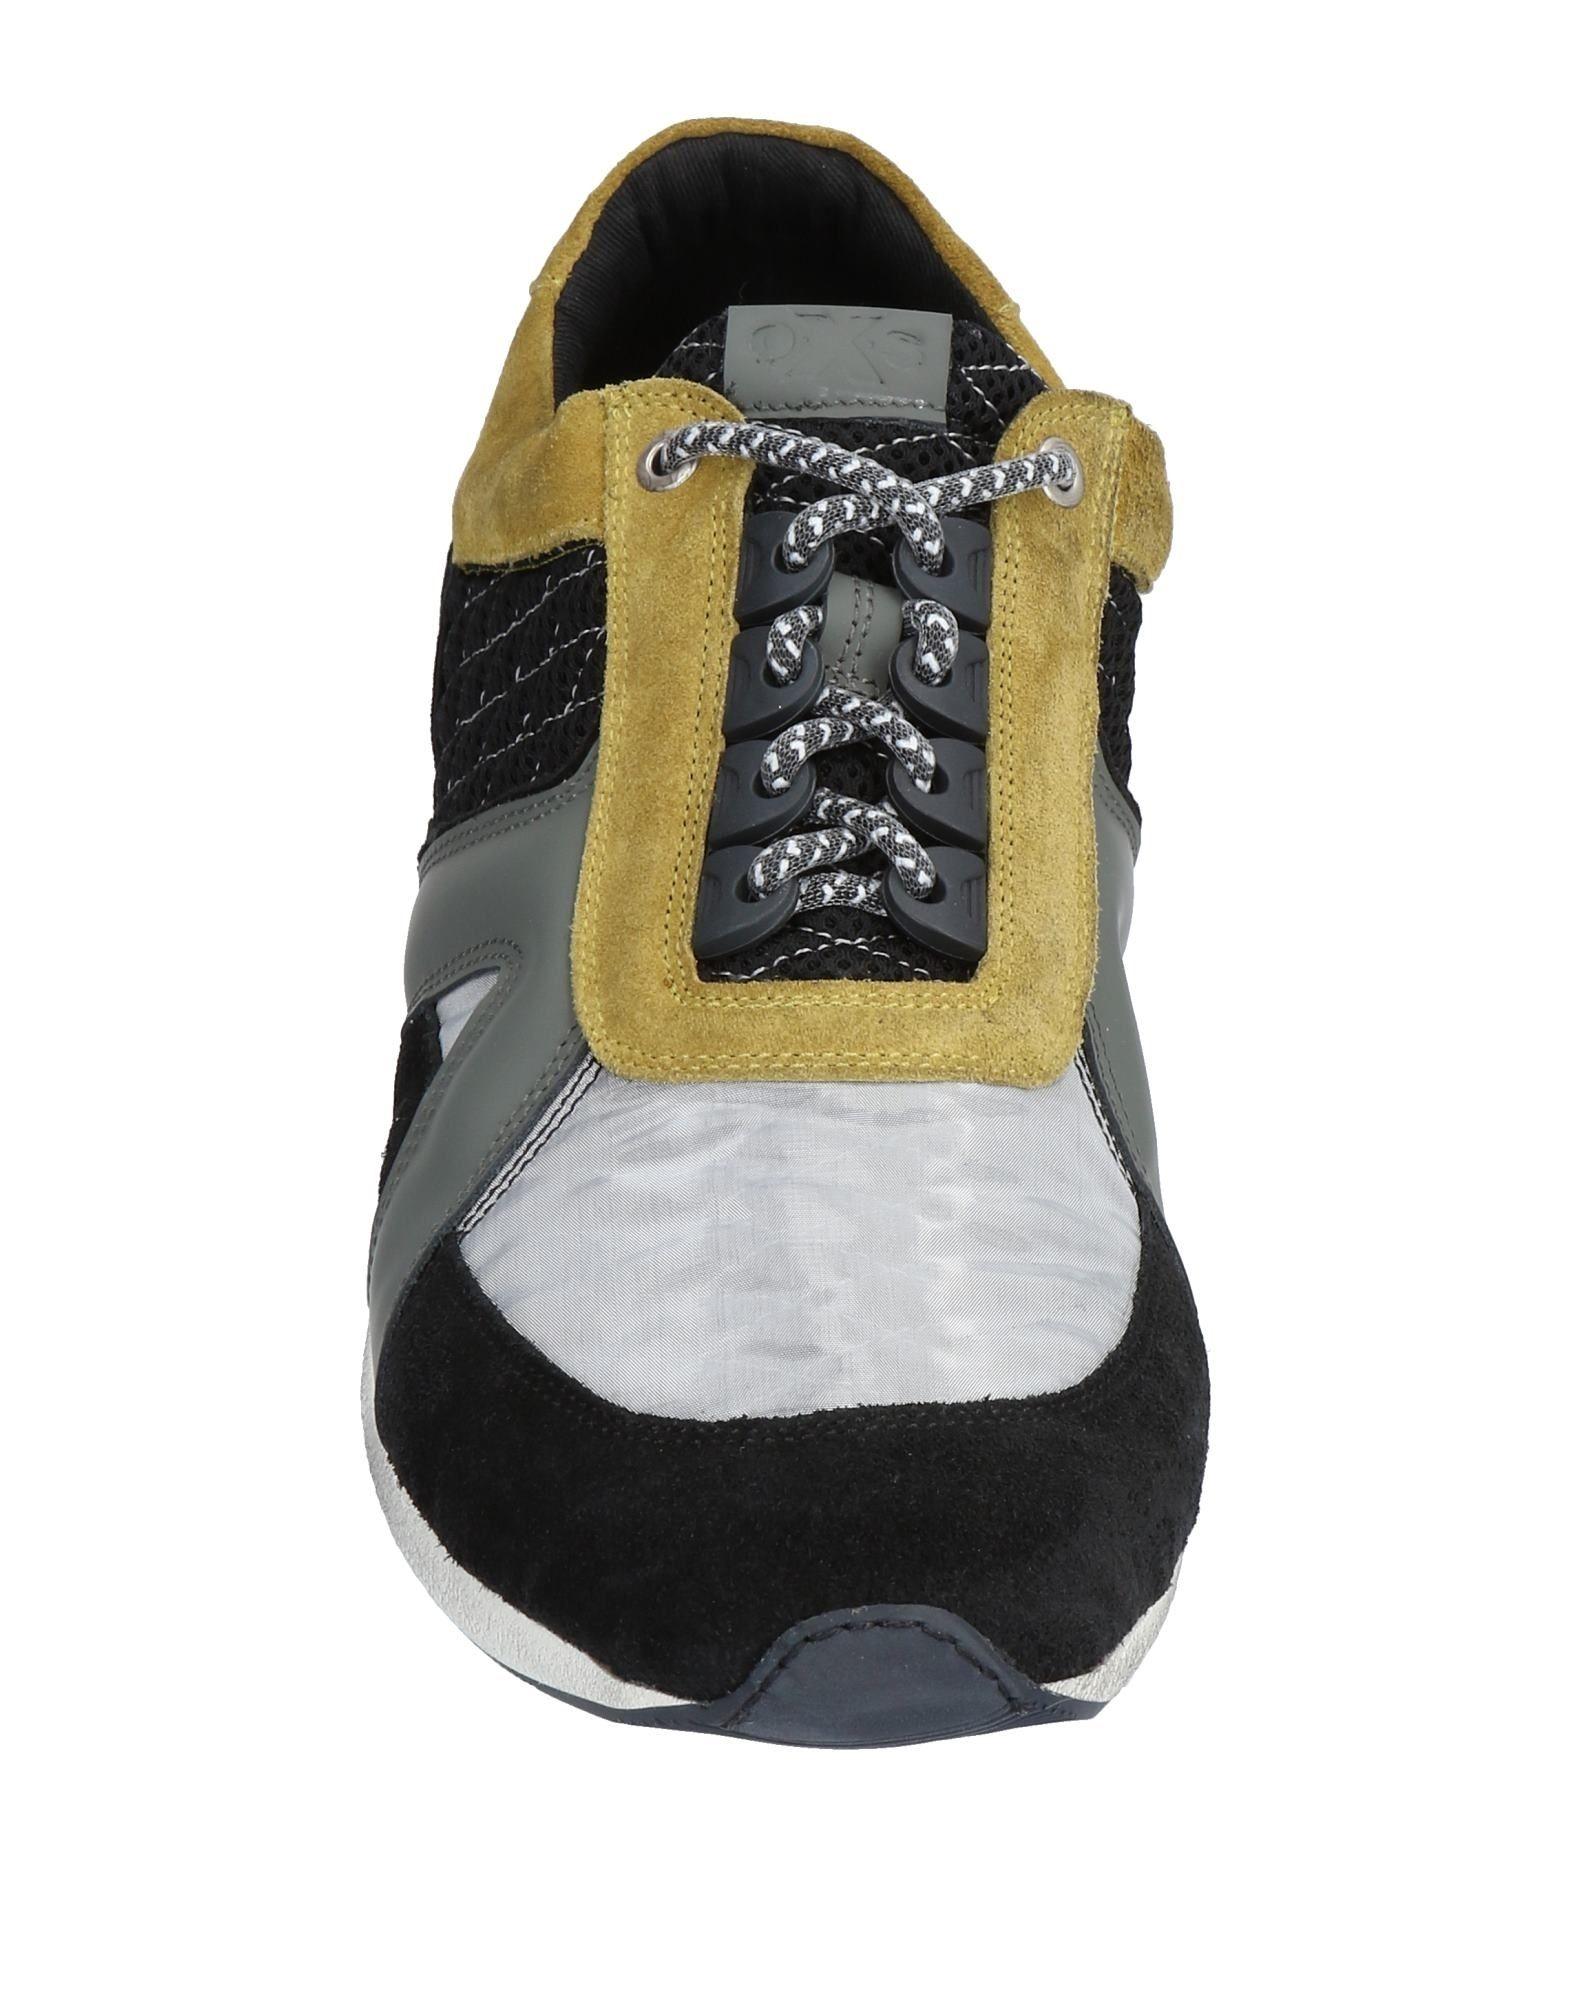 Rabatt echte  Schuhe O.X.S. Sneakers Herren  echte 11468102IC ceba5b